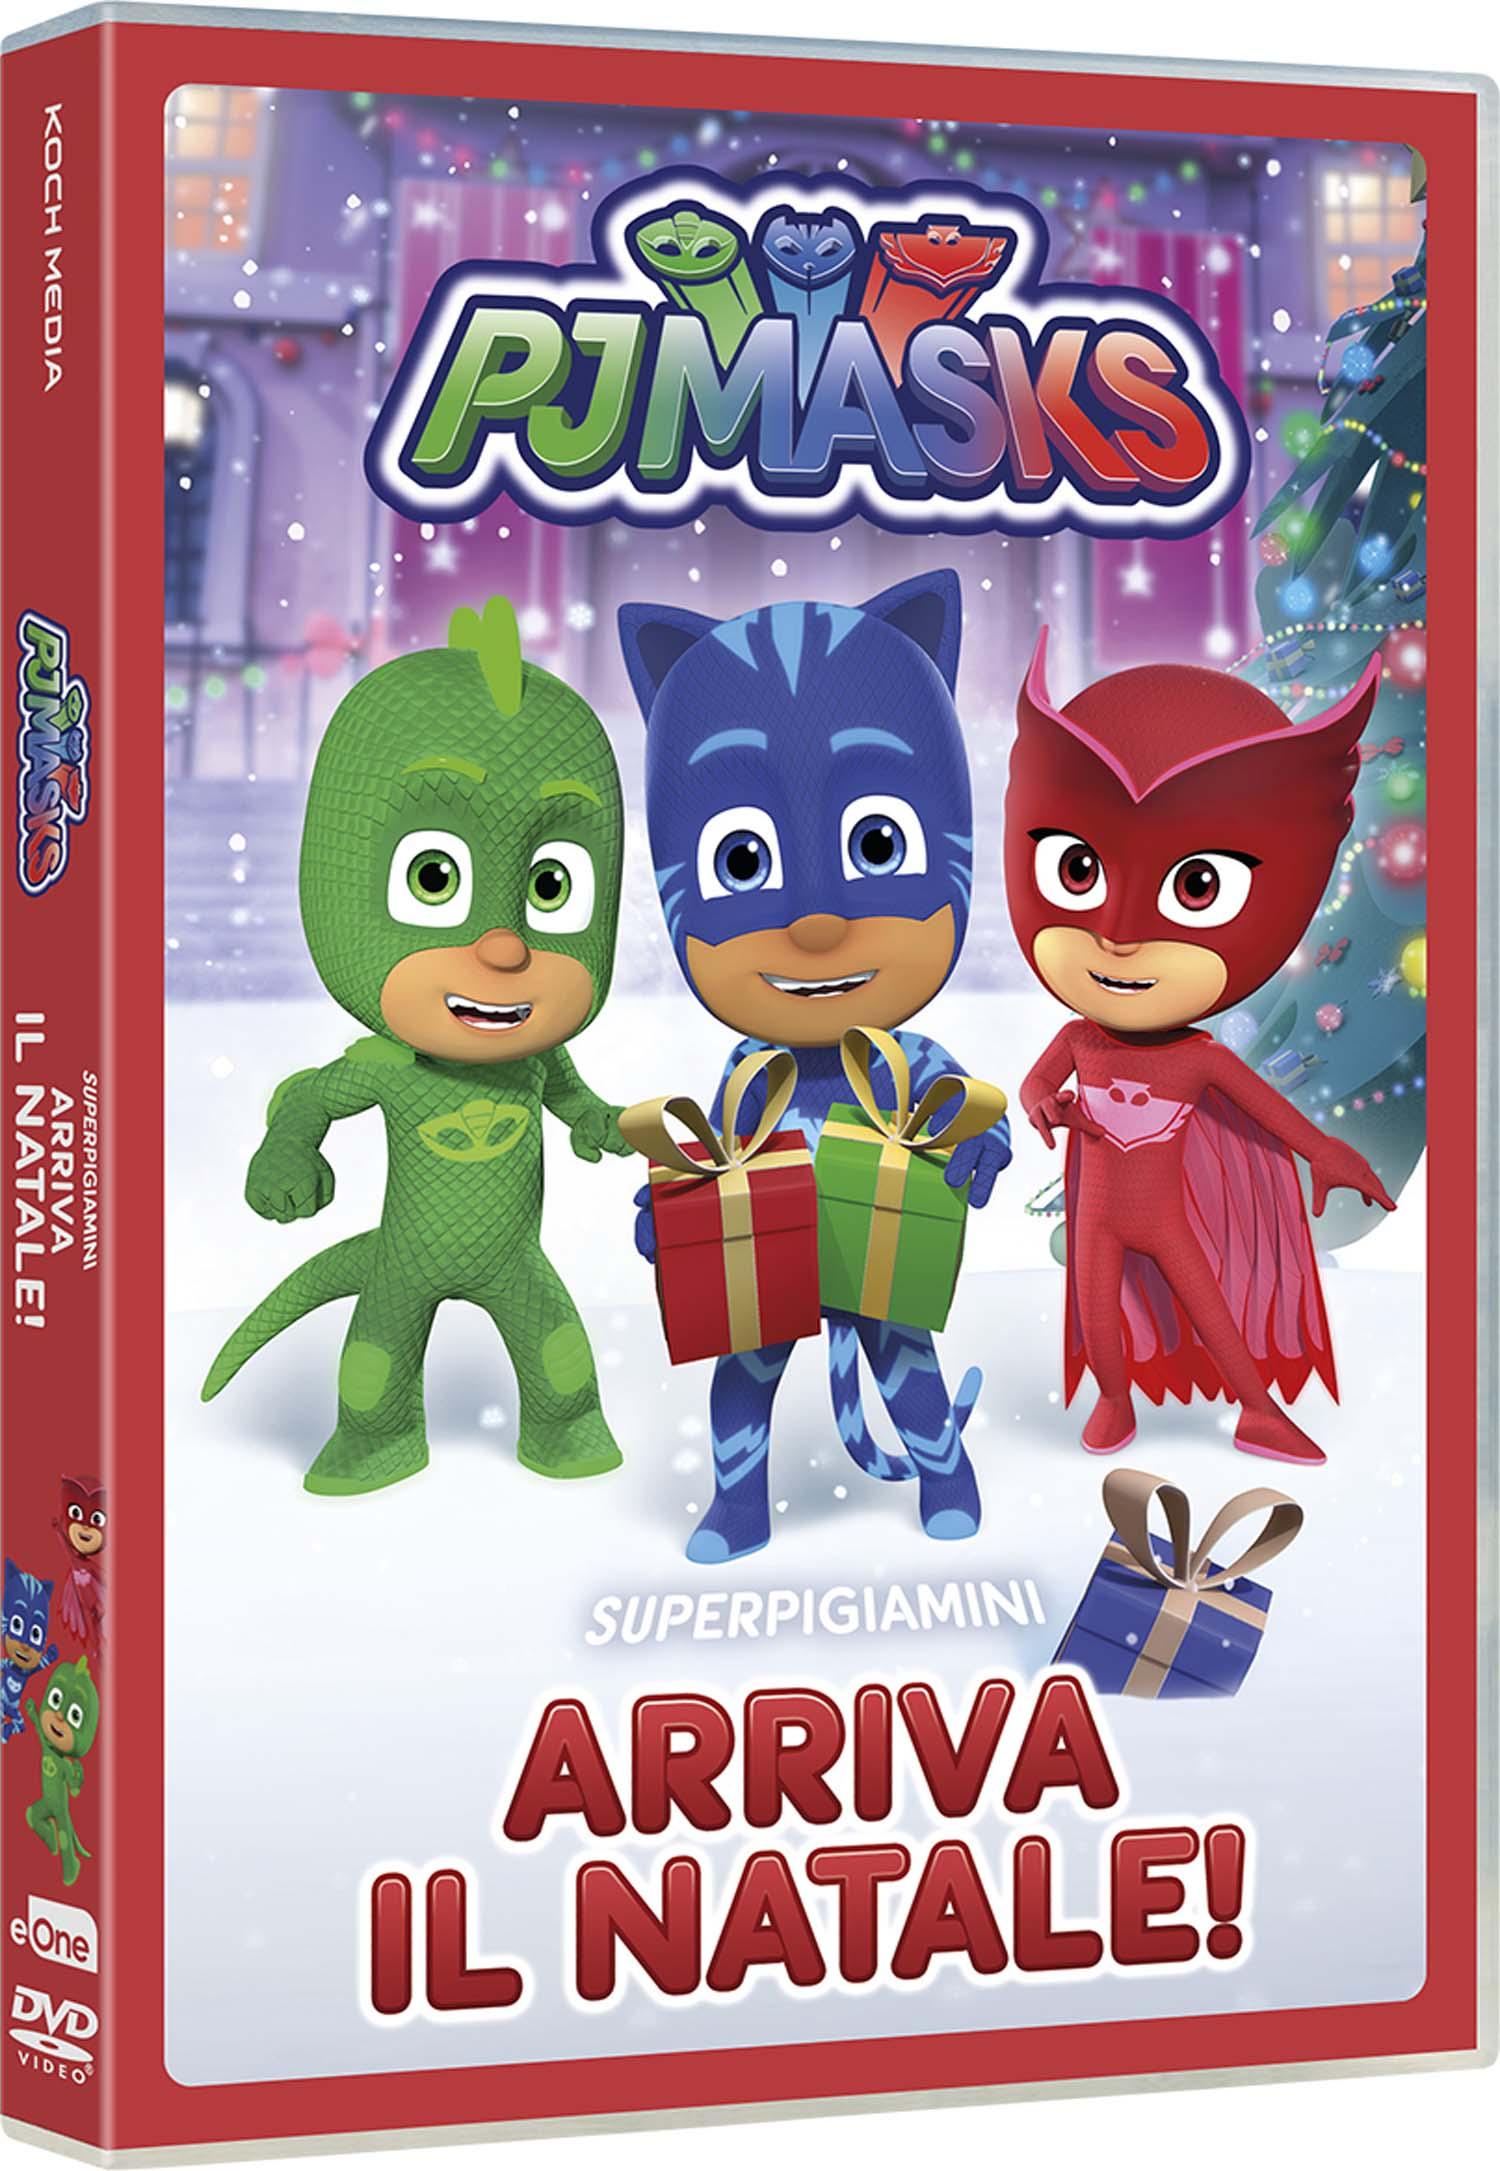 PJ MASKS - ARRIVA IL NATALE! (DVD)